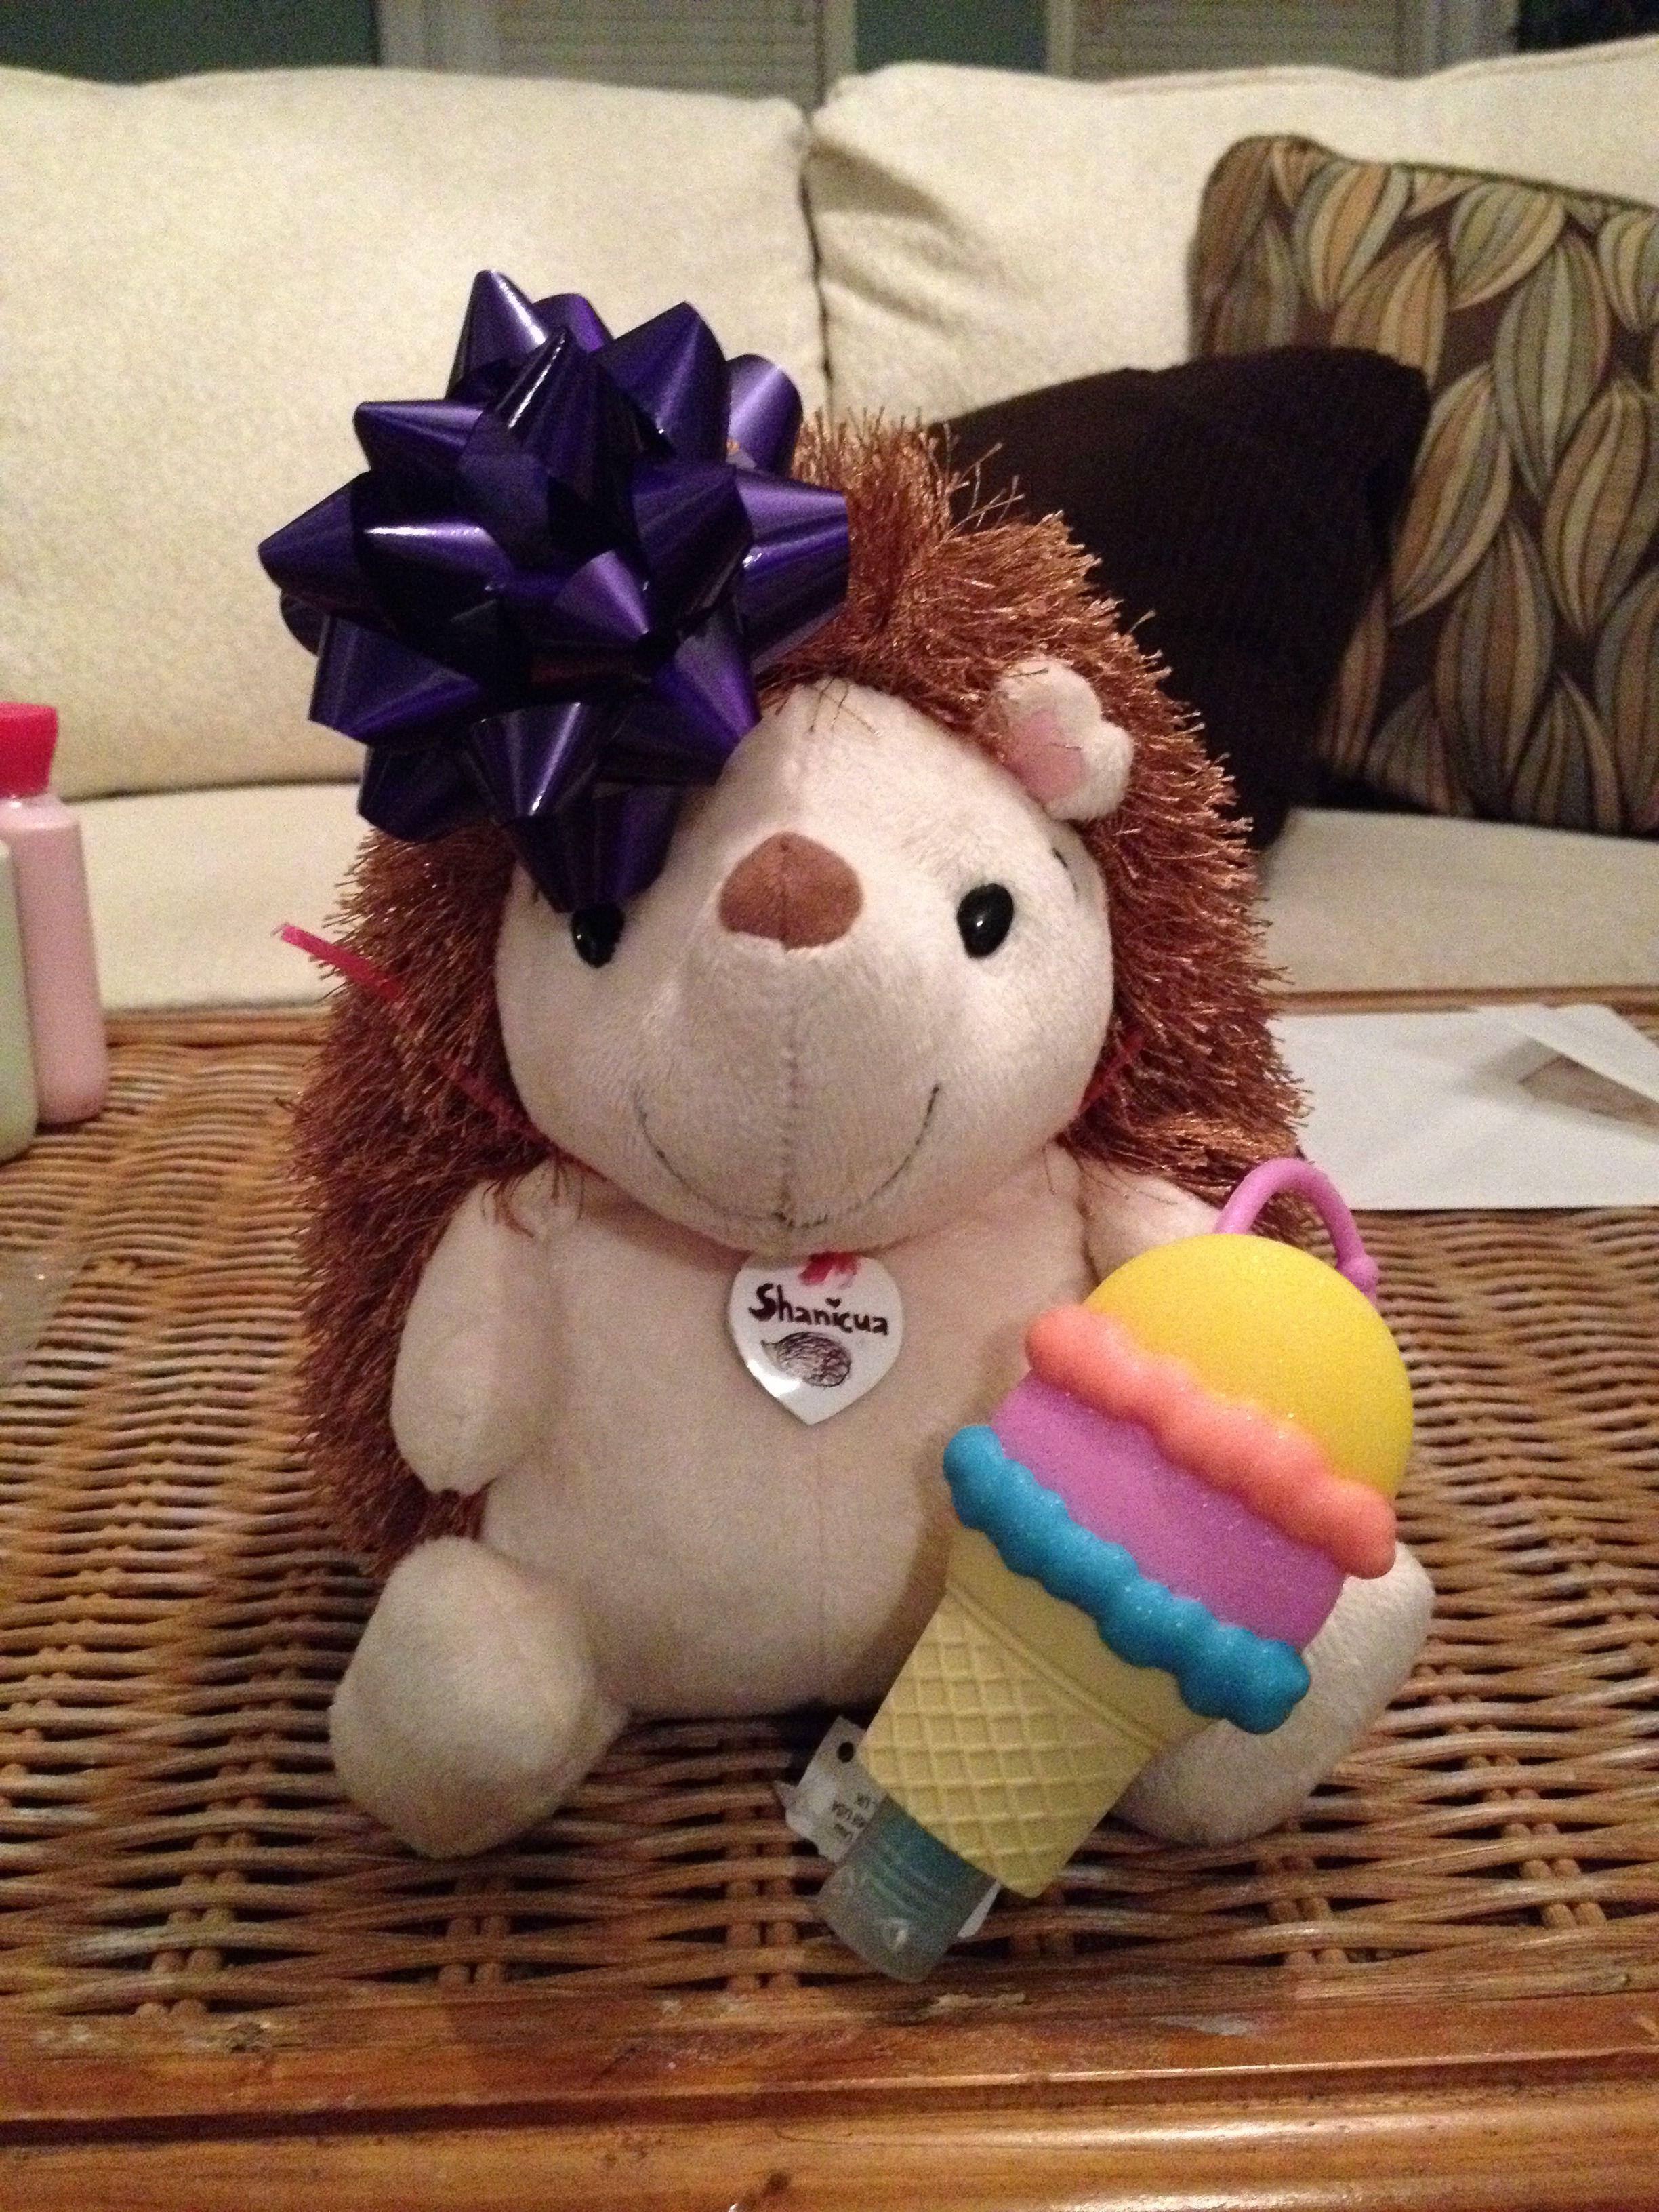 Birthday Shaniqua! Today is my birthday! Wish me a happy